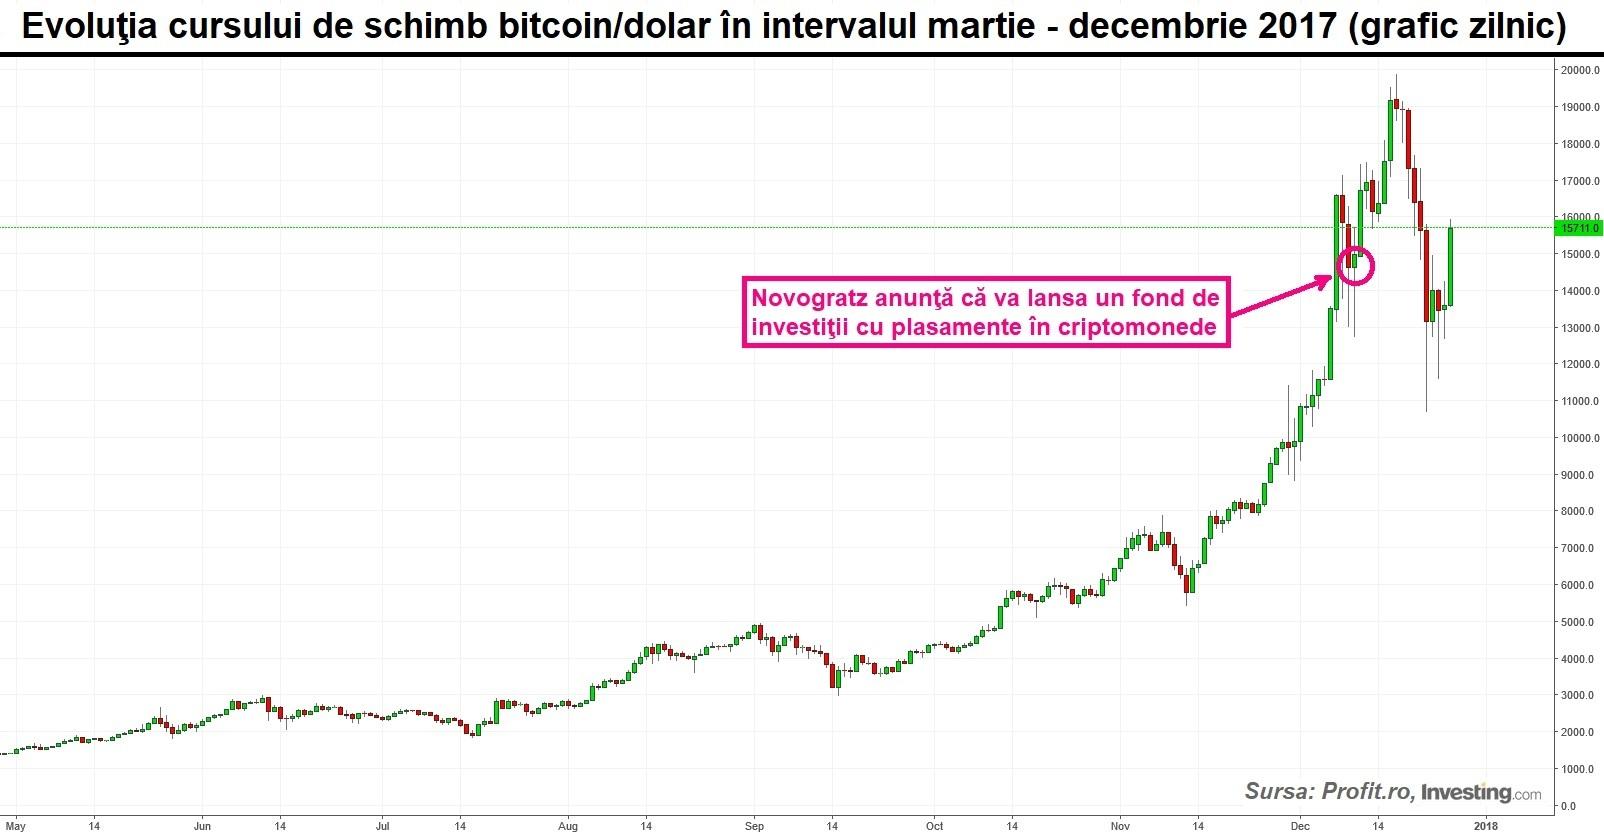 graficul ratei de schimb bitcoin